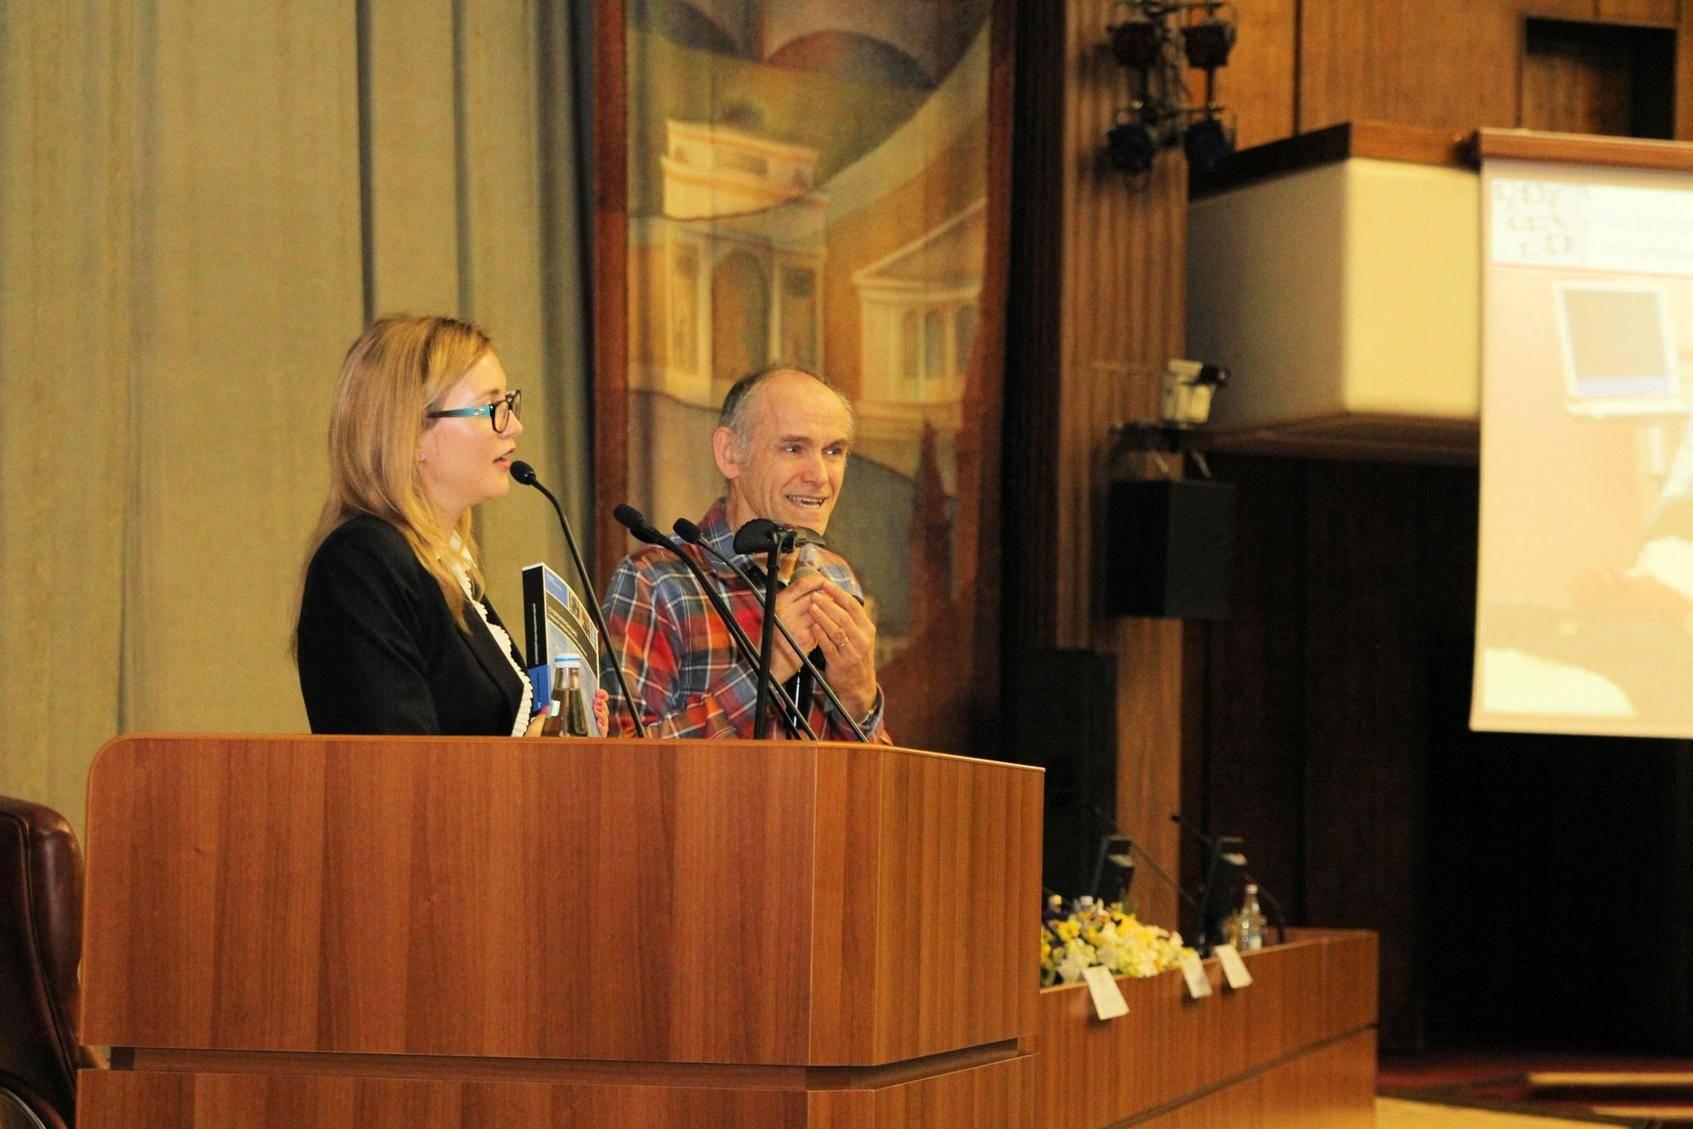 08 RUS Moscow Municipality 20130404 Congress Presentation Team Jan And E ShibanovaBookPresenting